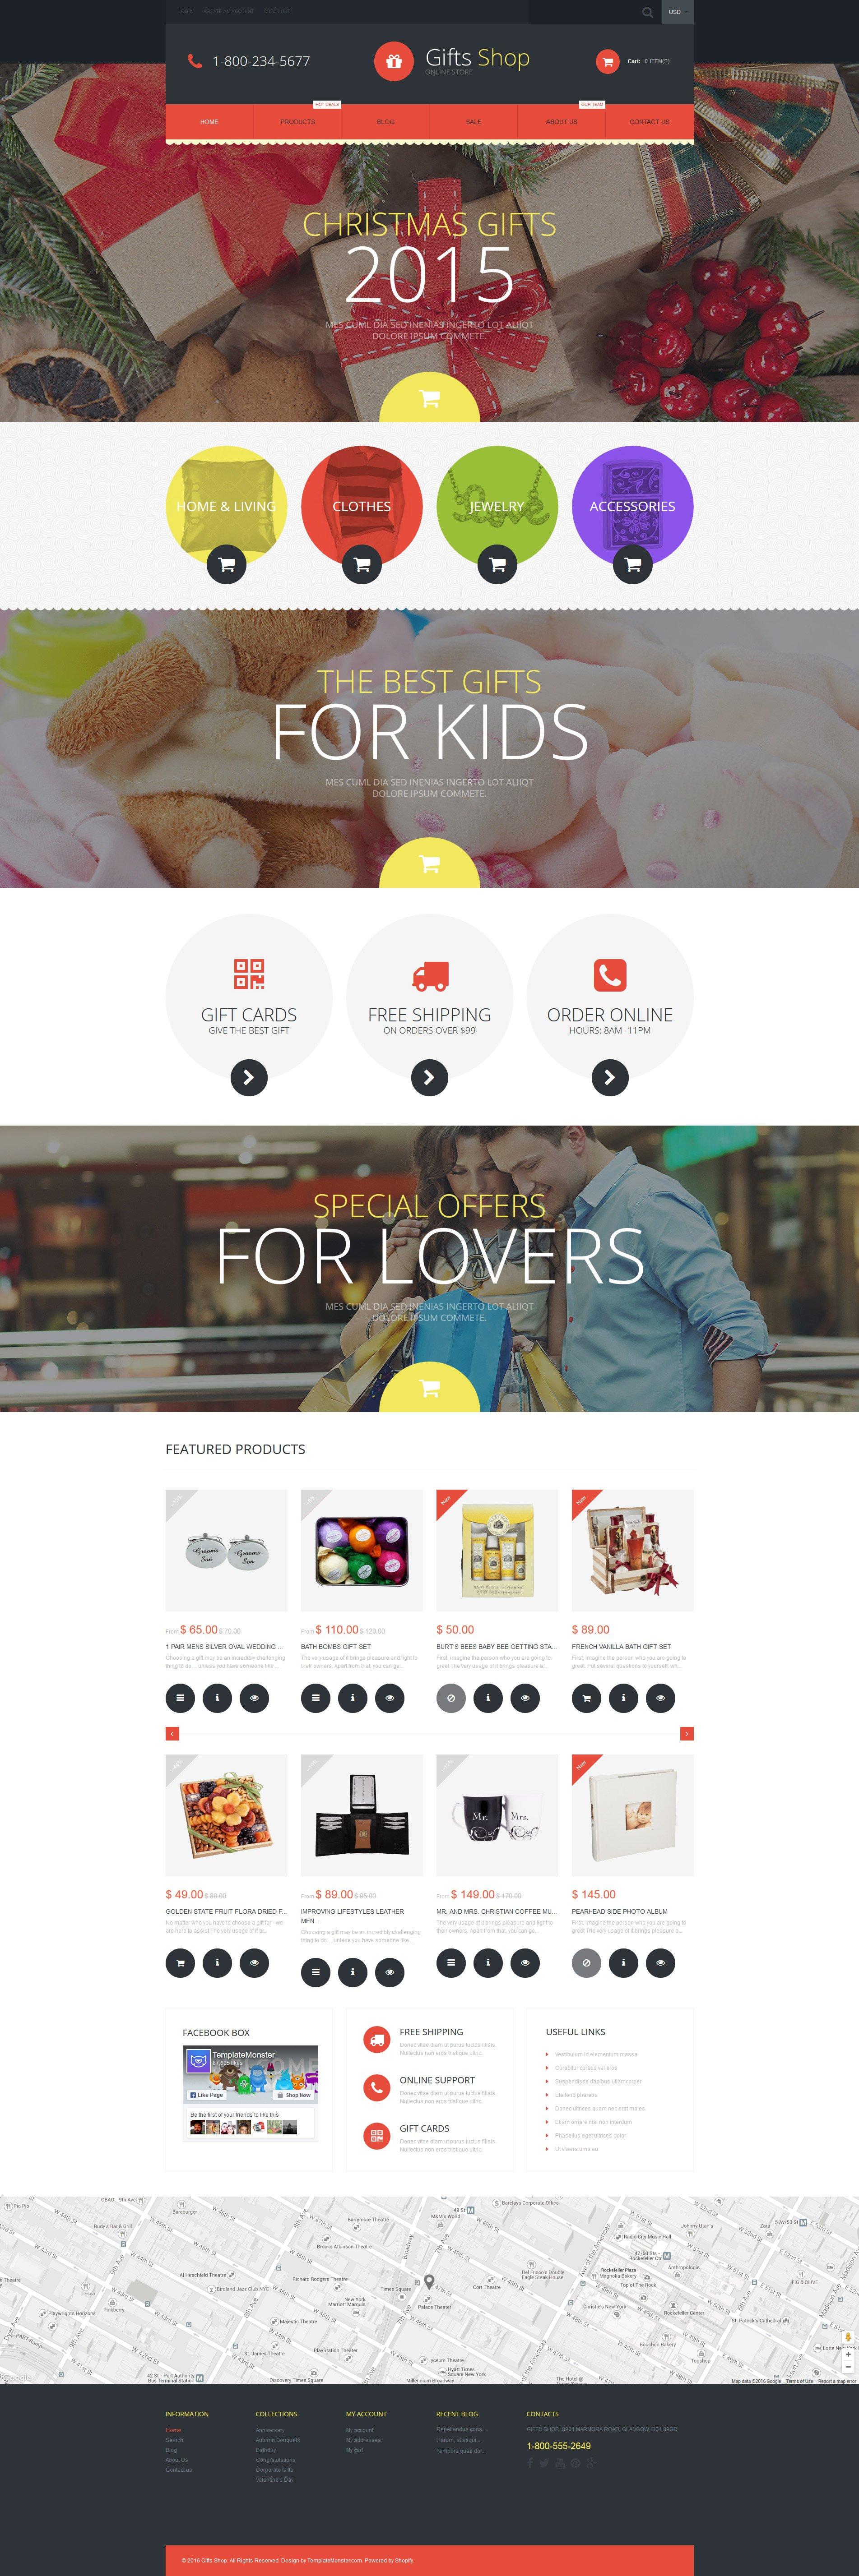 Gifts Shop Tema de Shopify №55607 - captura de tela